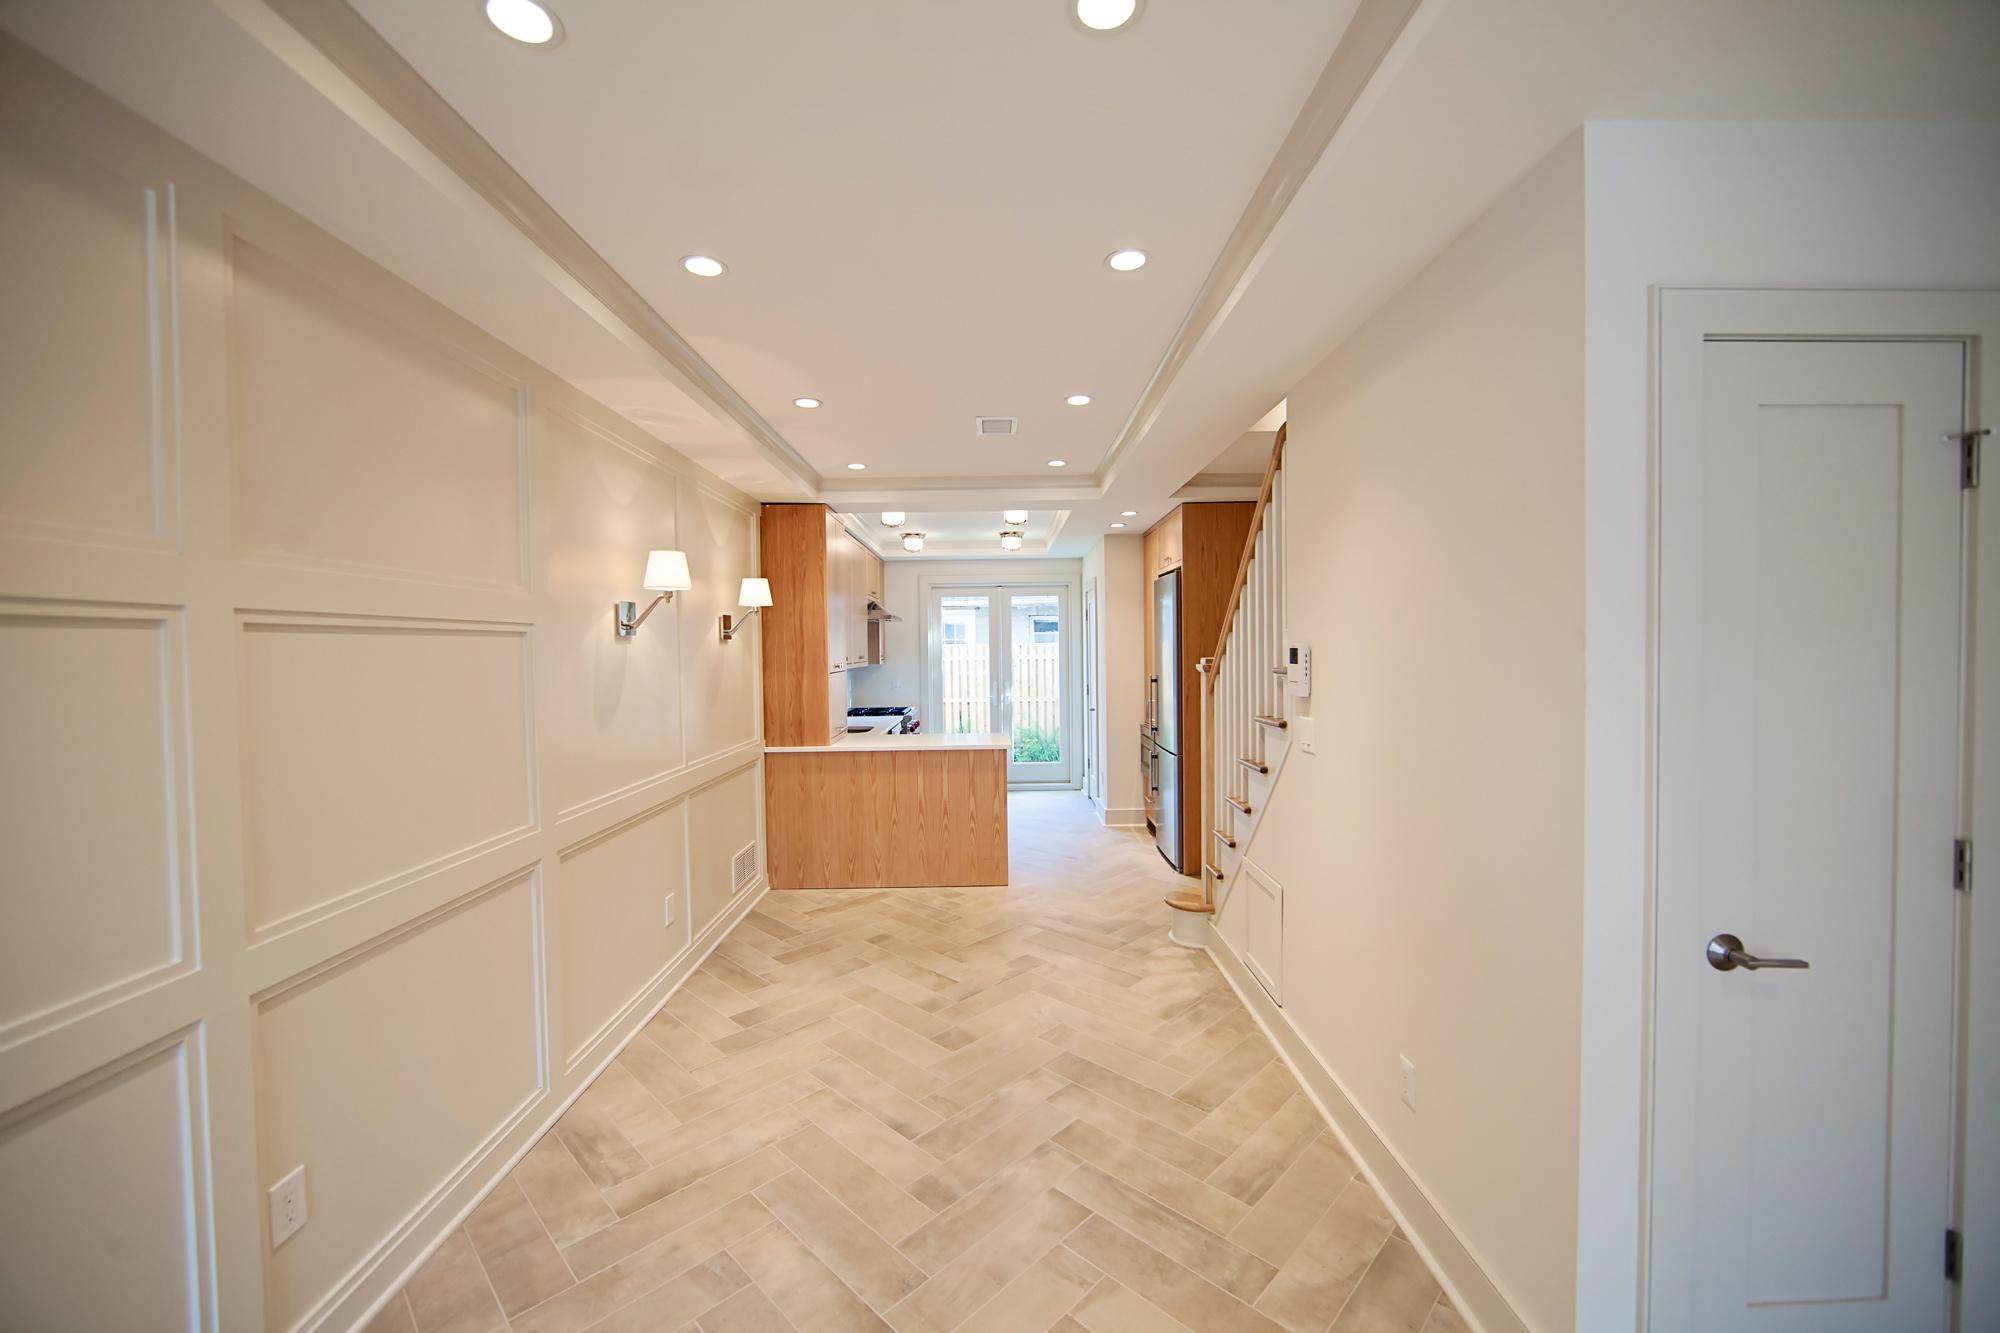 thompson-fine-home-renovations-hoboken-new-jersey-construction-2.jpg